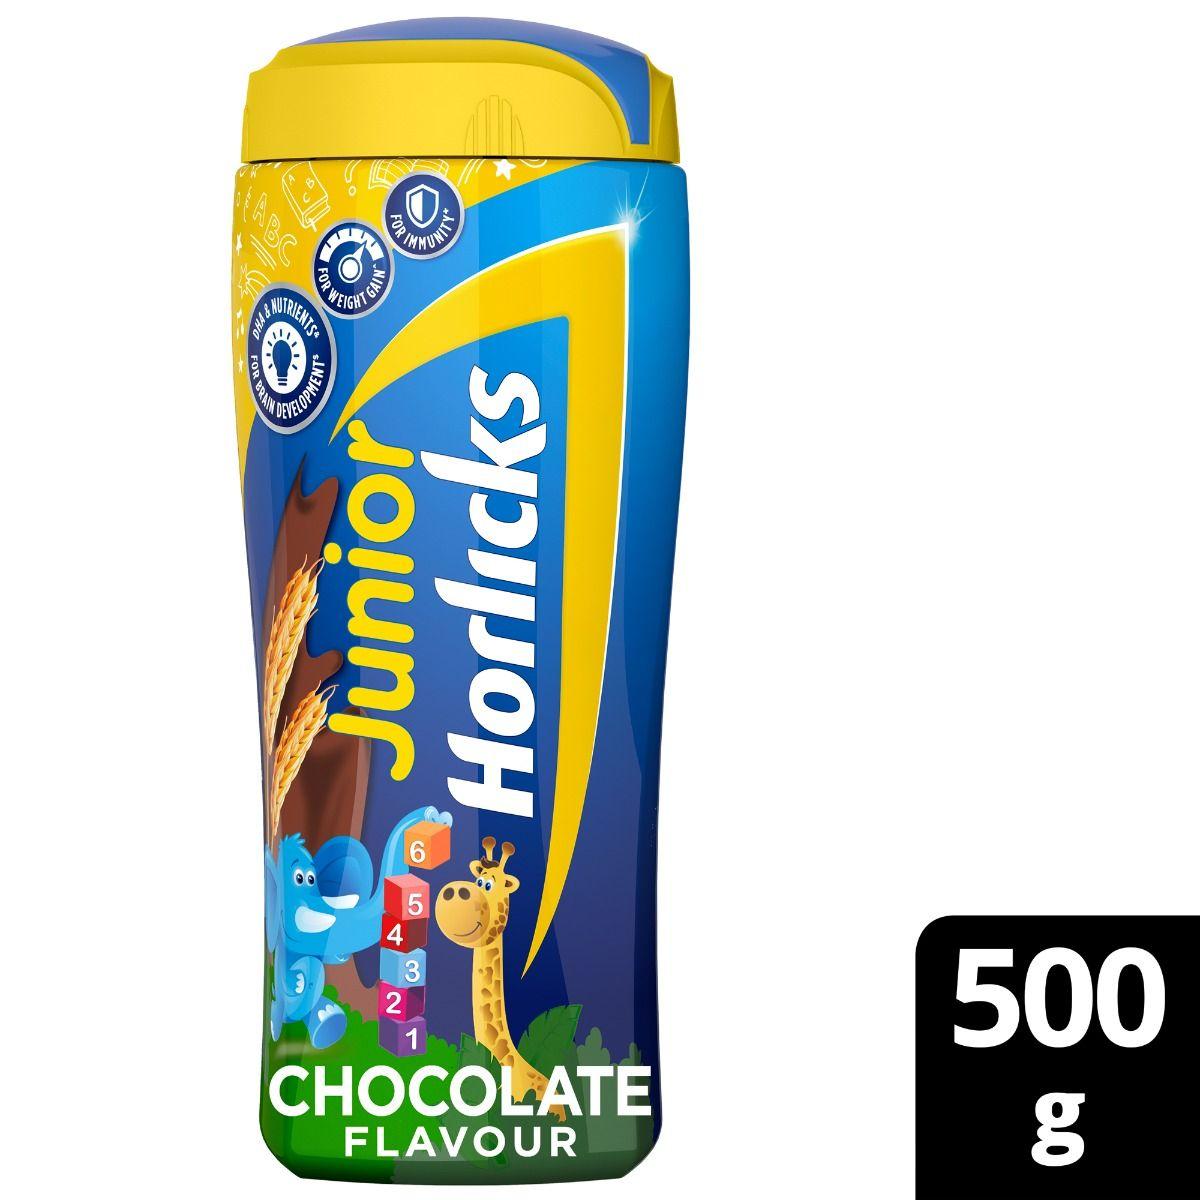 Junior Horlicks Chocolate Flavoured Health & Nutrition Drink, 500 gm Jar